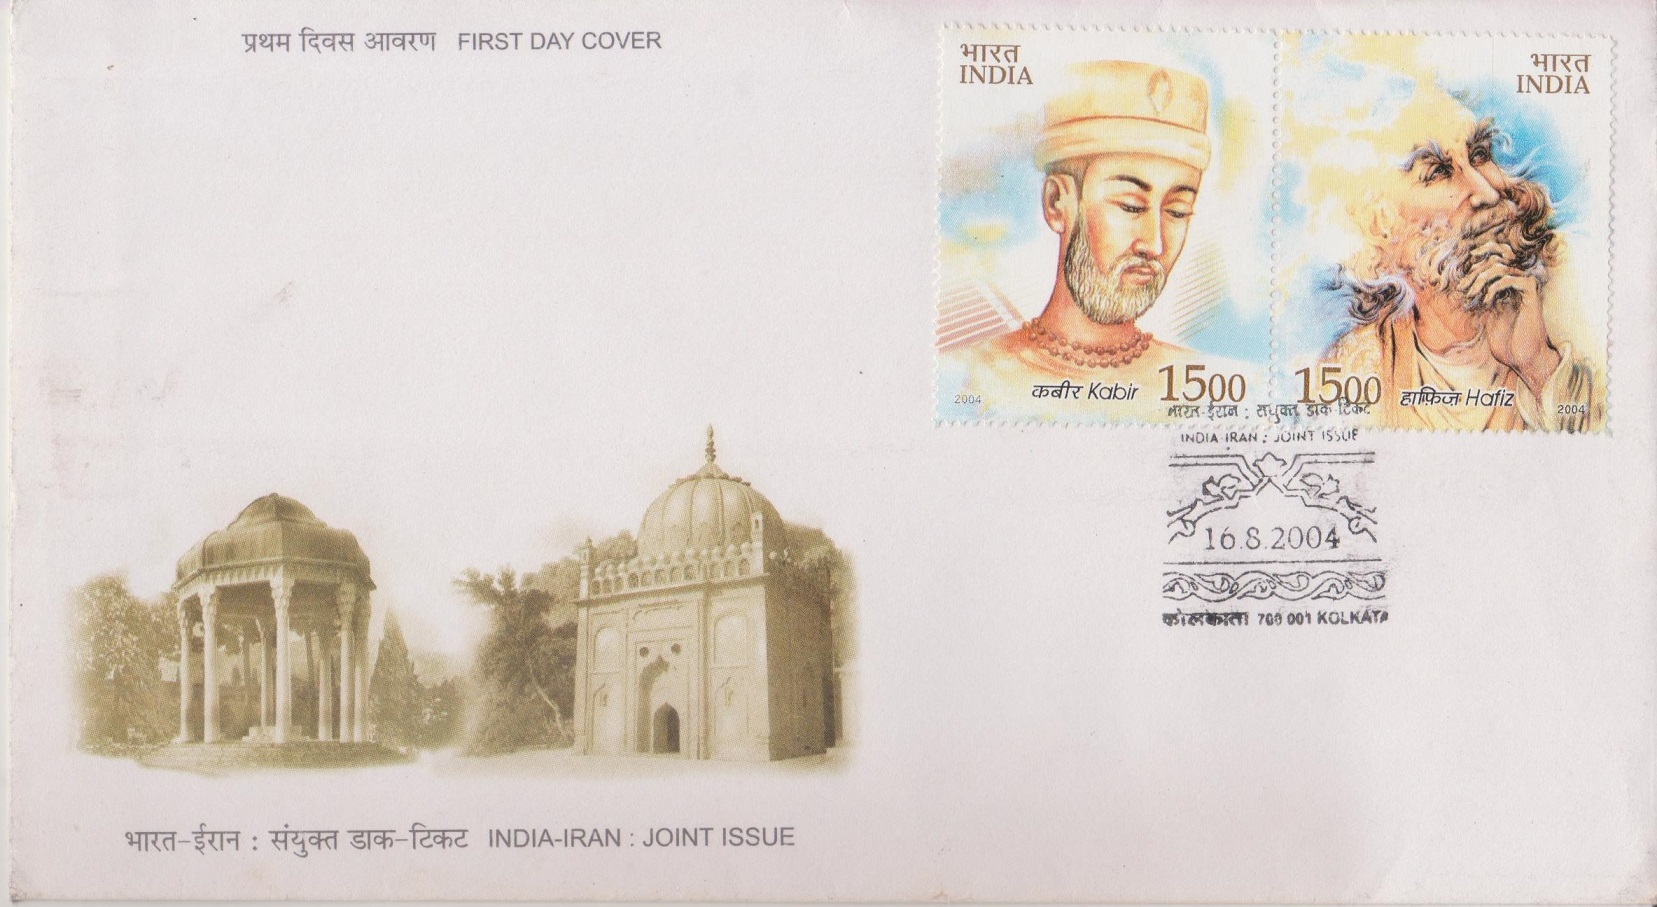 Tomb of Hafez (Hafezieh) and Shrine of Kabir